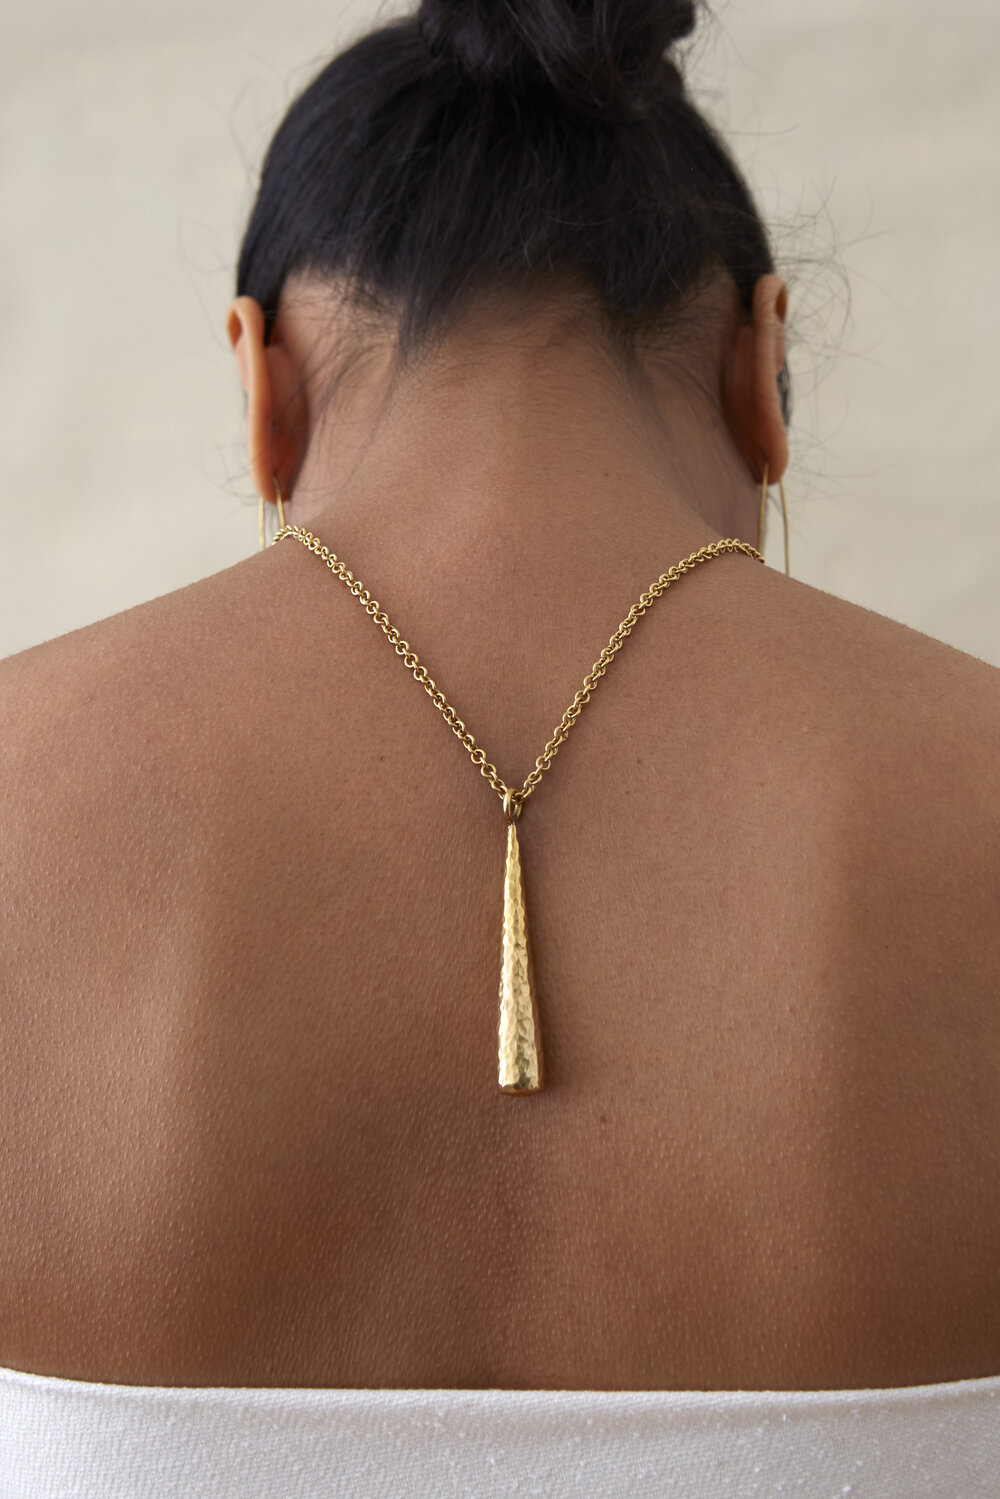 UZITO Pendant Necklace